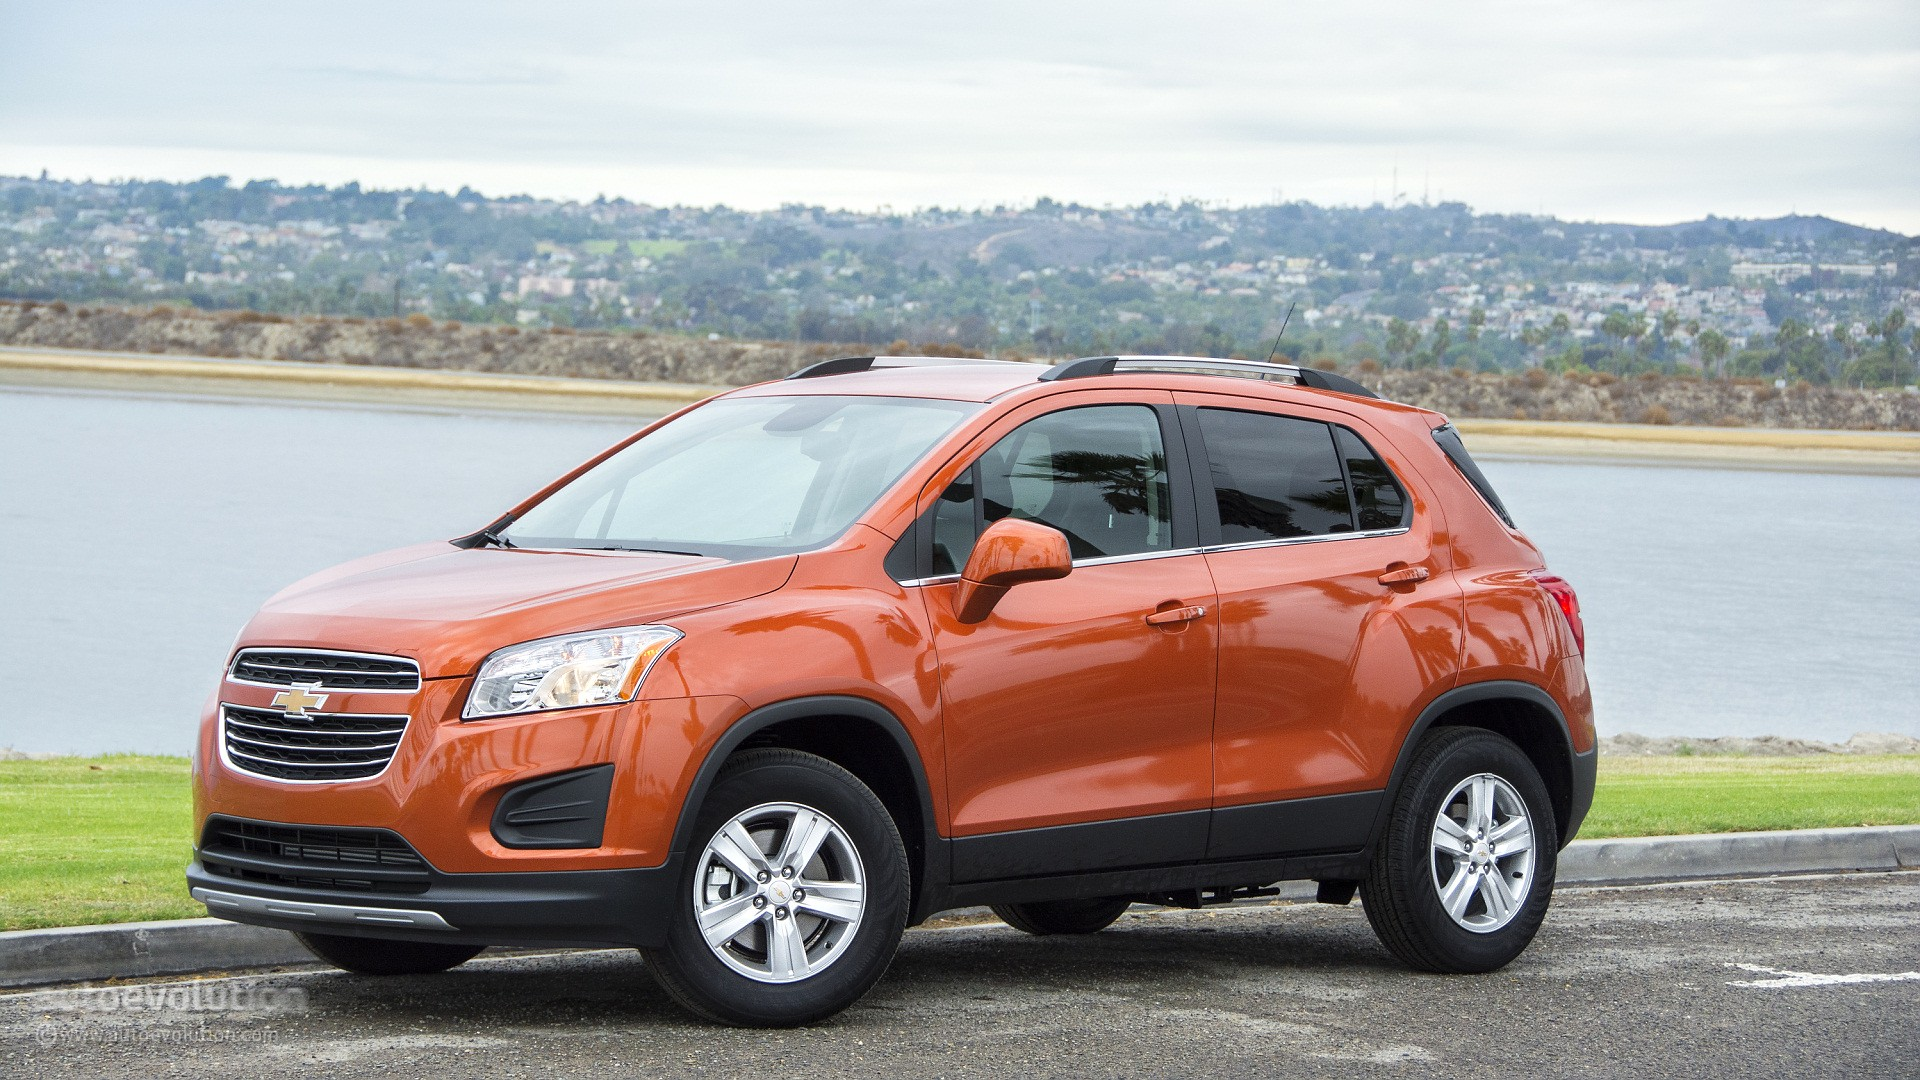 2015 Chevrolet Trax Review - autoevolution